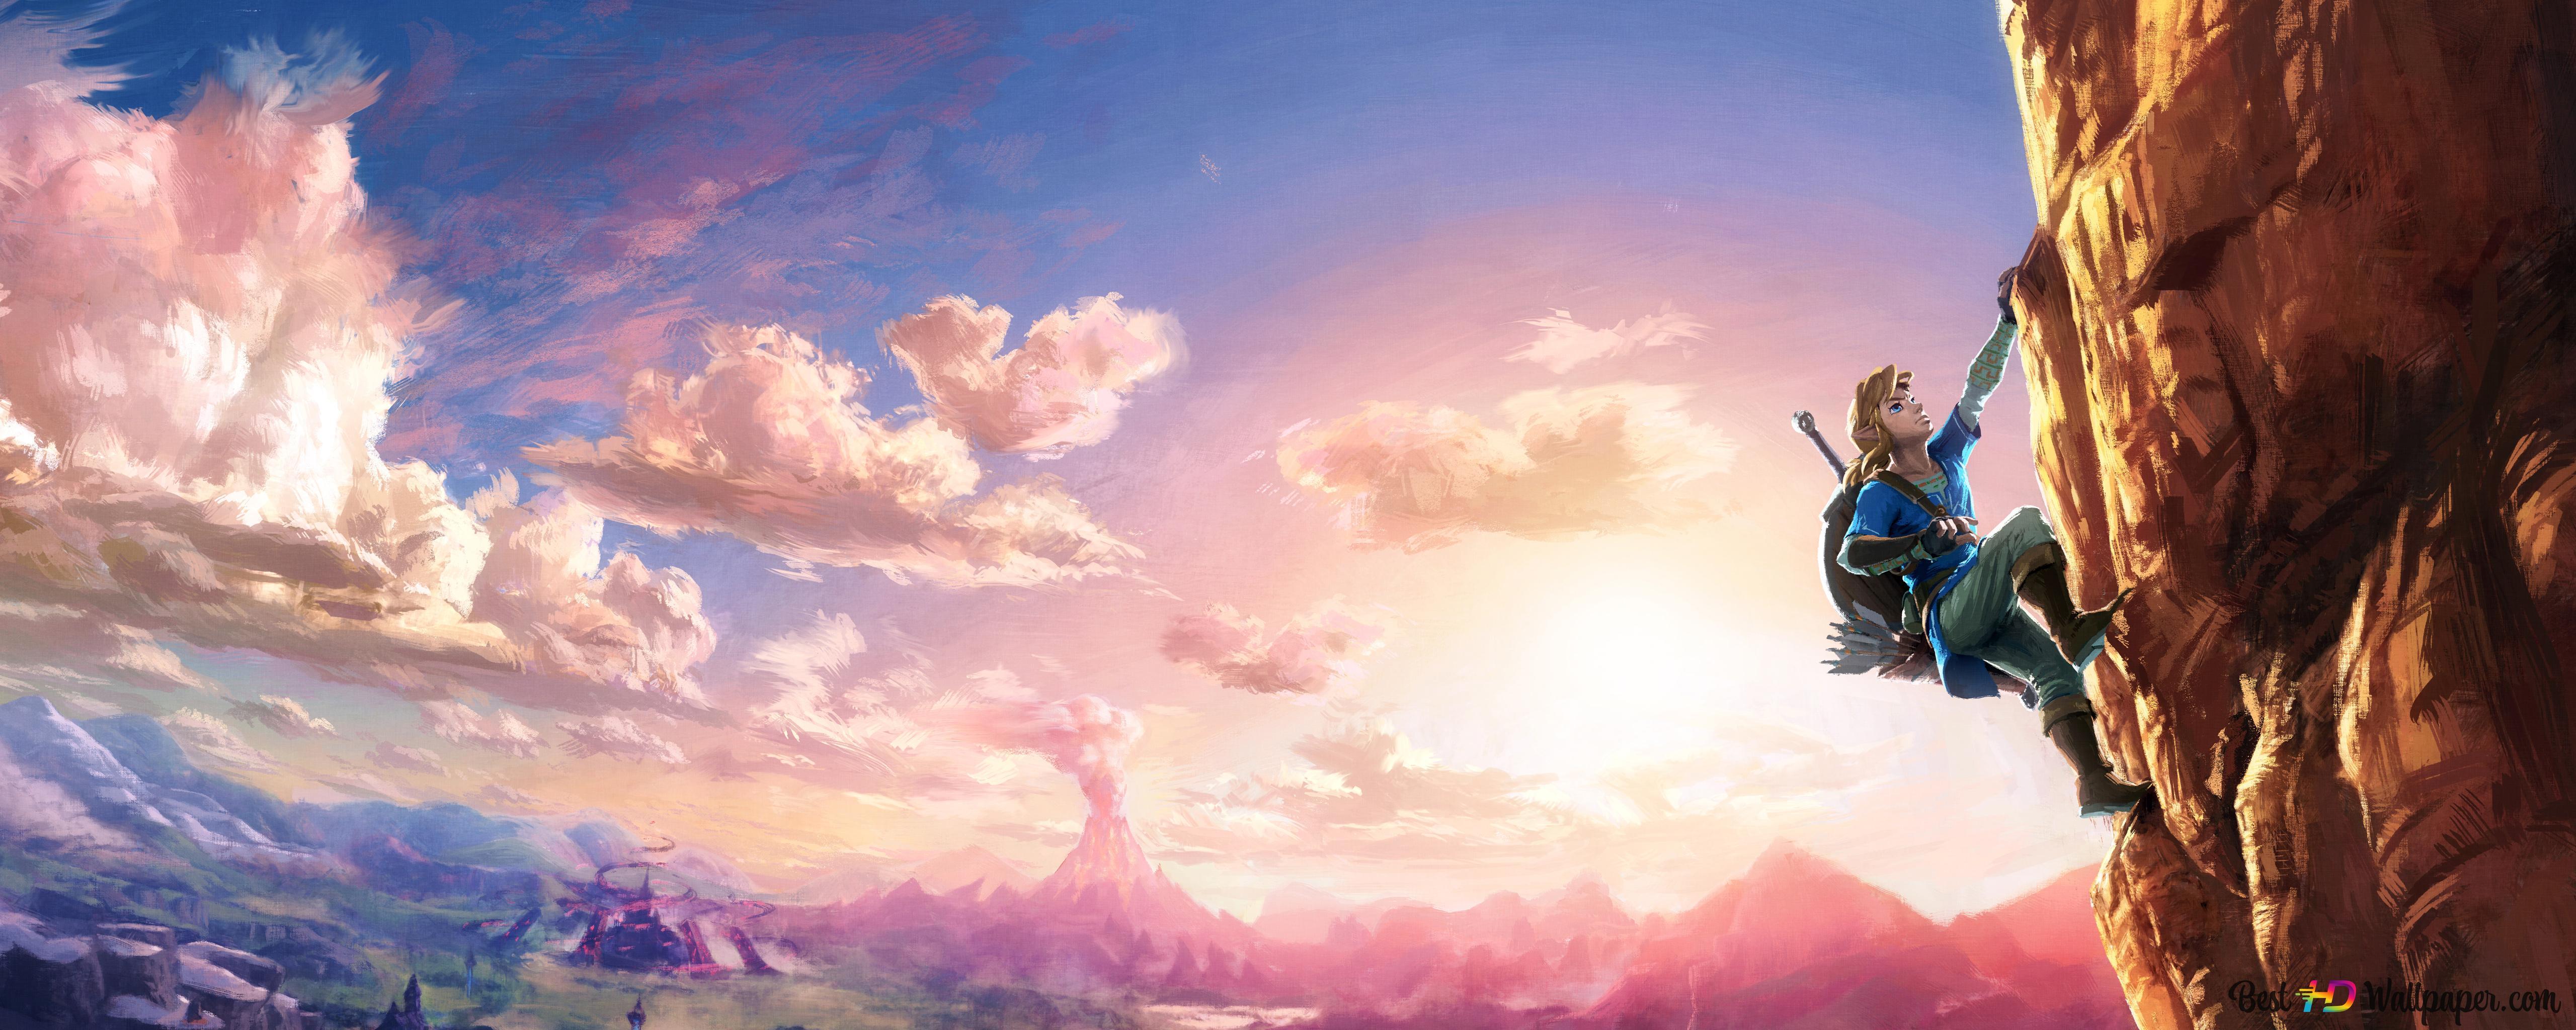 The Legend Of Zelda Breath Of The Wild Digital Art Hd Wallpaper